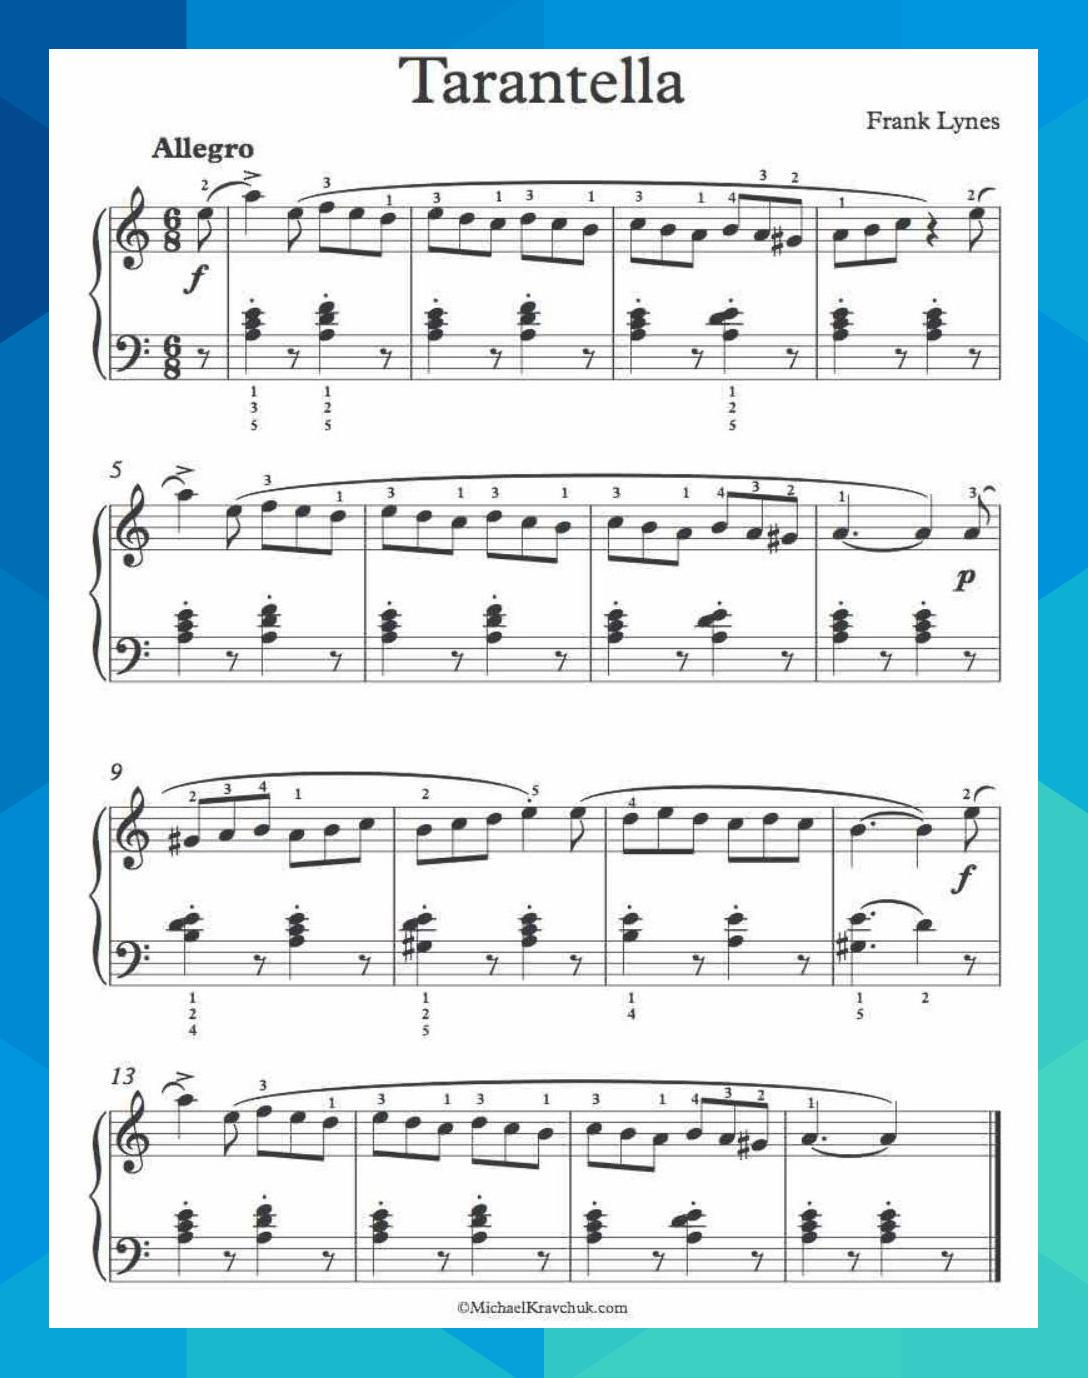 Free Piano Sheet Music Tarantella Op 14 No 8 Frank